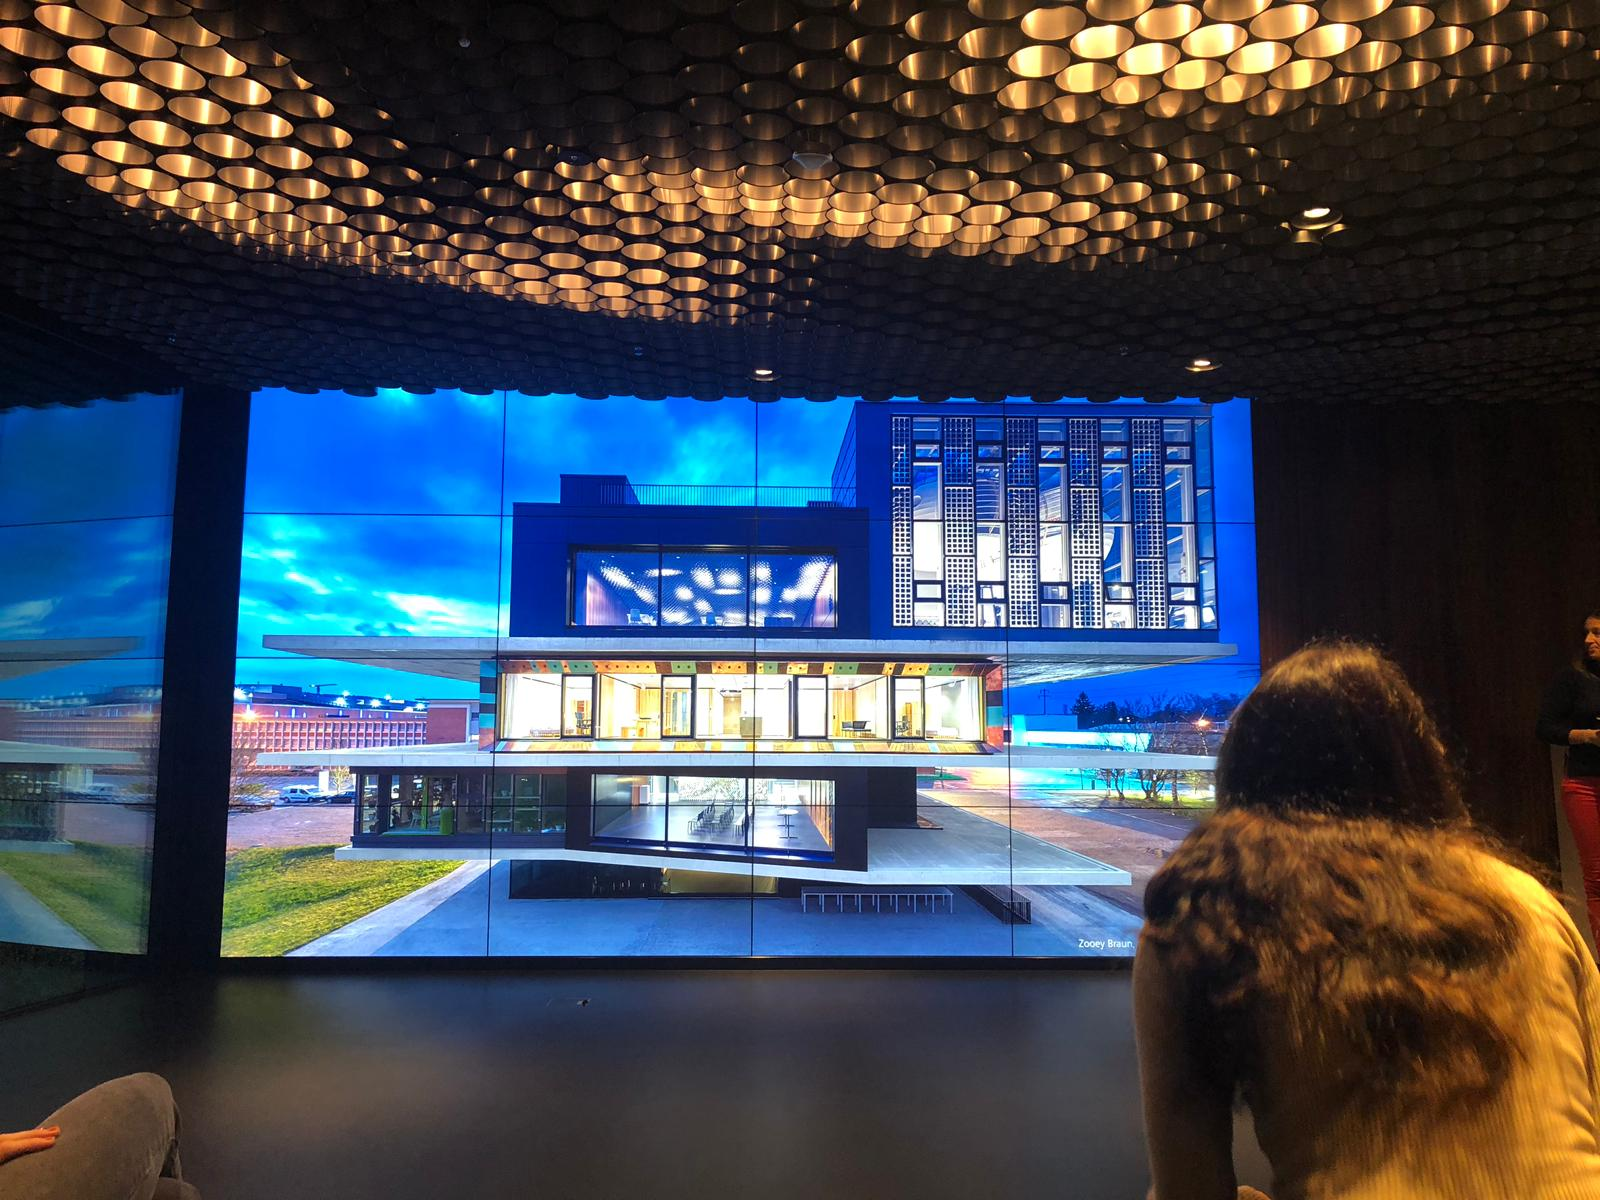 The presentation room